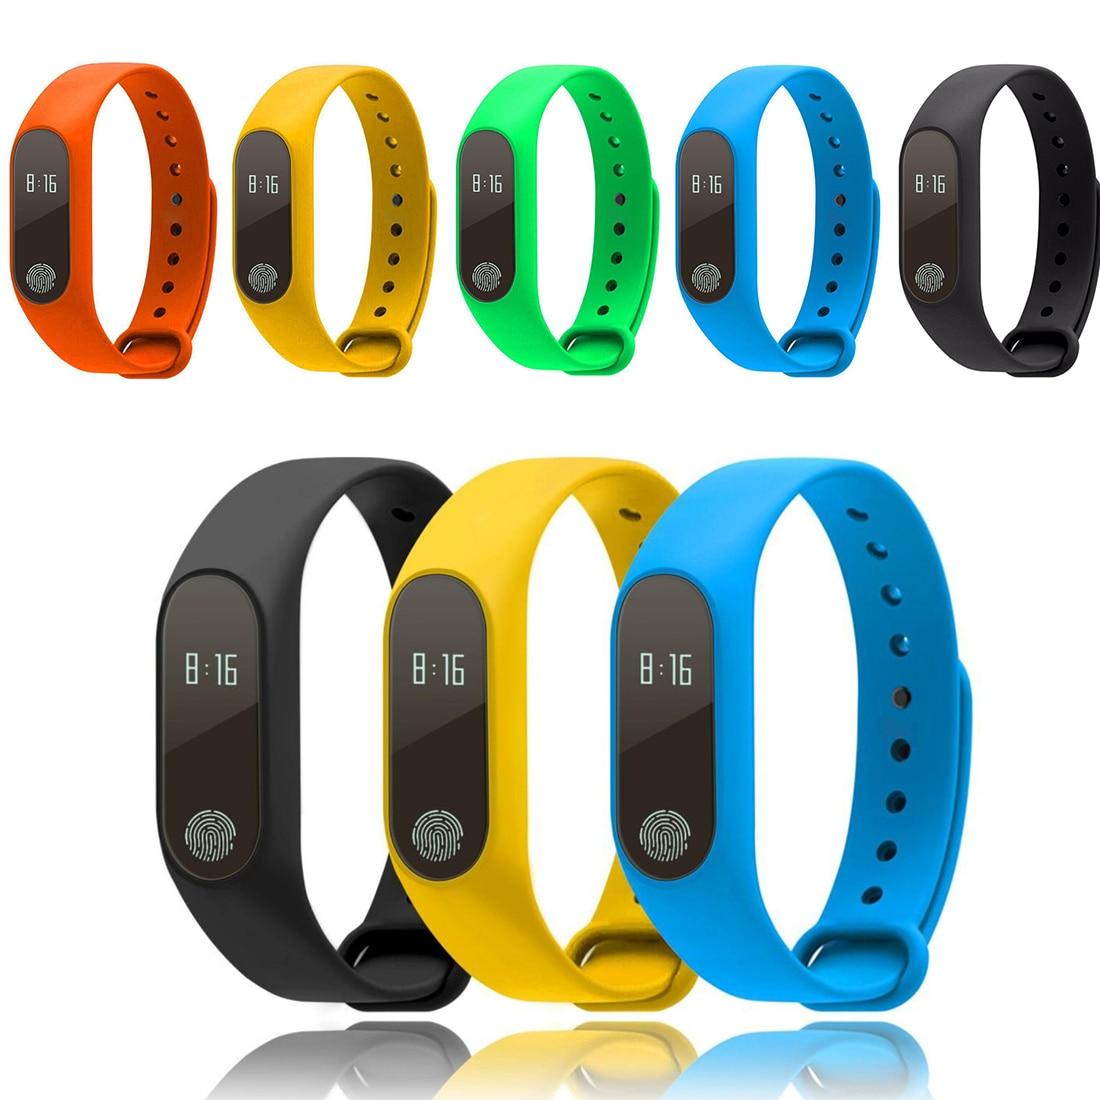 цена на Digital LCD Walking Pedometer Wrist Sport Fitness Watch Bracelet Display Sports Tracker Running Step Calorie Counter